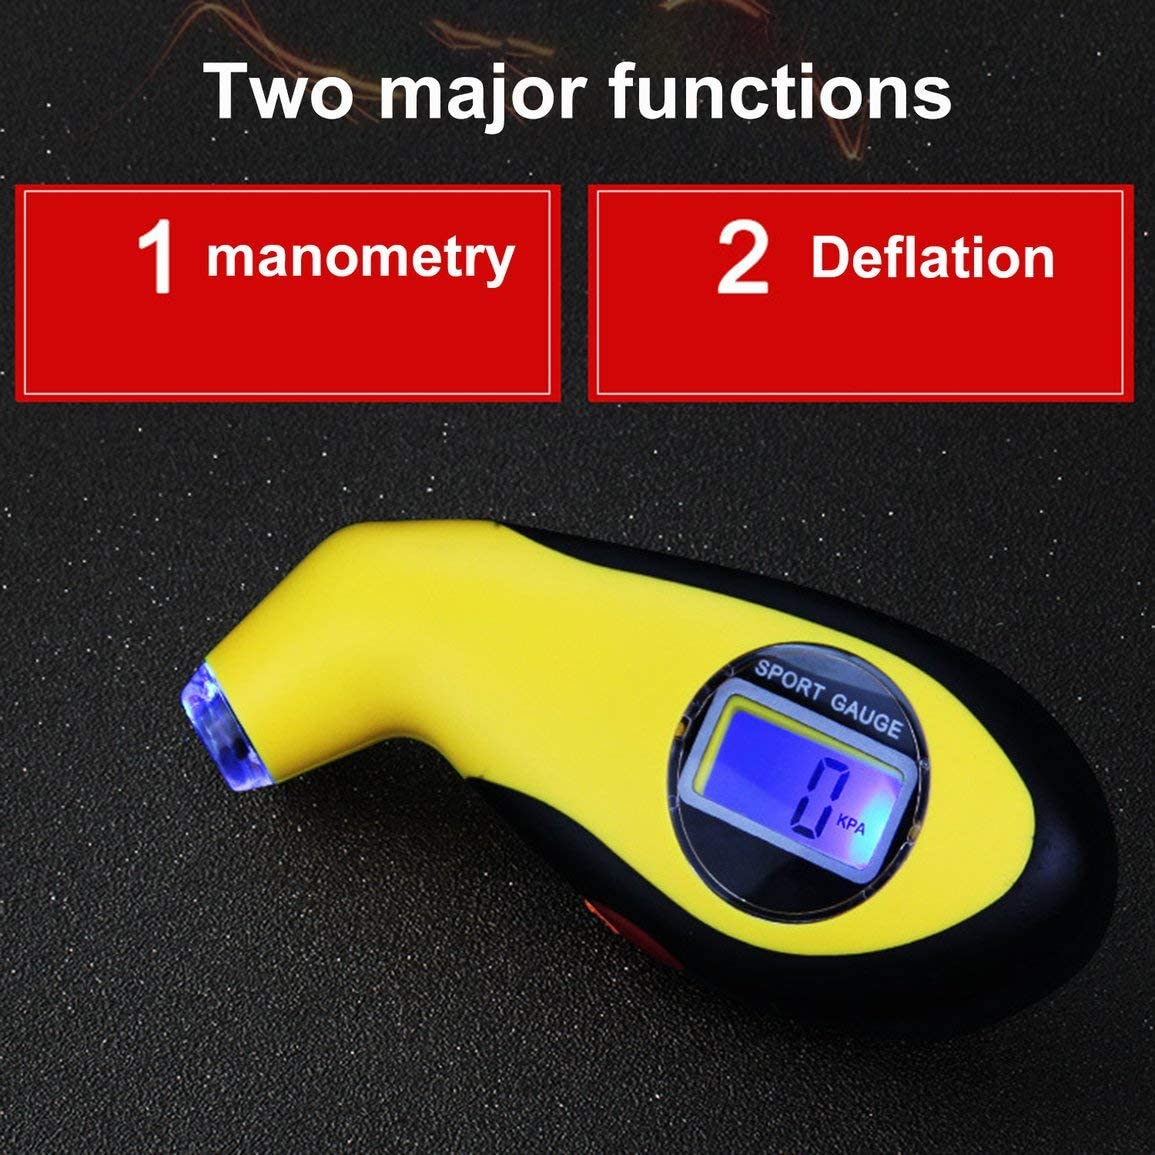 Color:Yellow /& black Garciakia Car Electronic Digital LCD Tire Pressure Gauge Meter 0-100 PSI Backlight Tyre Manometer Barometers Tester Tool